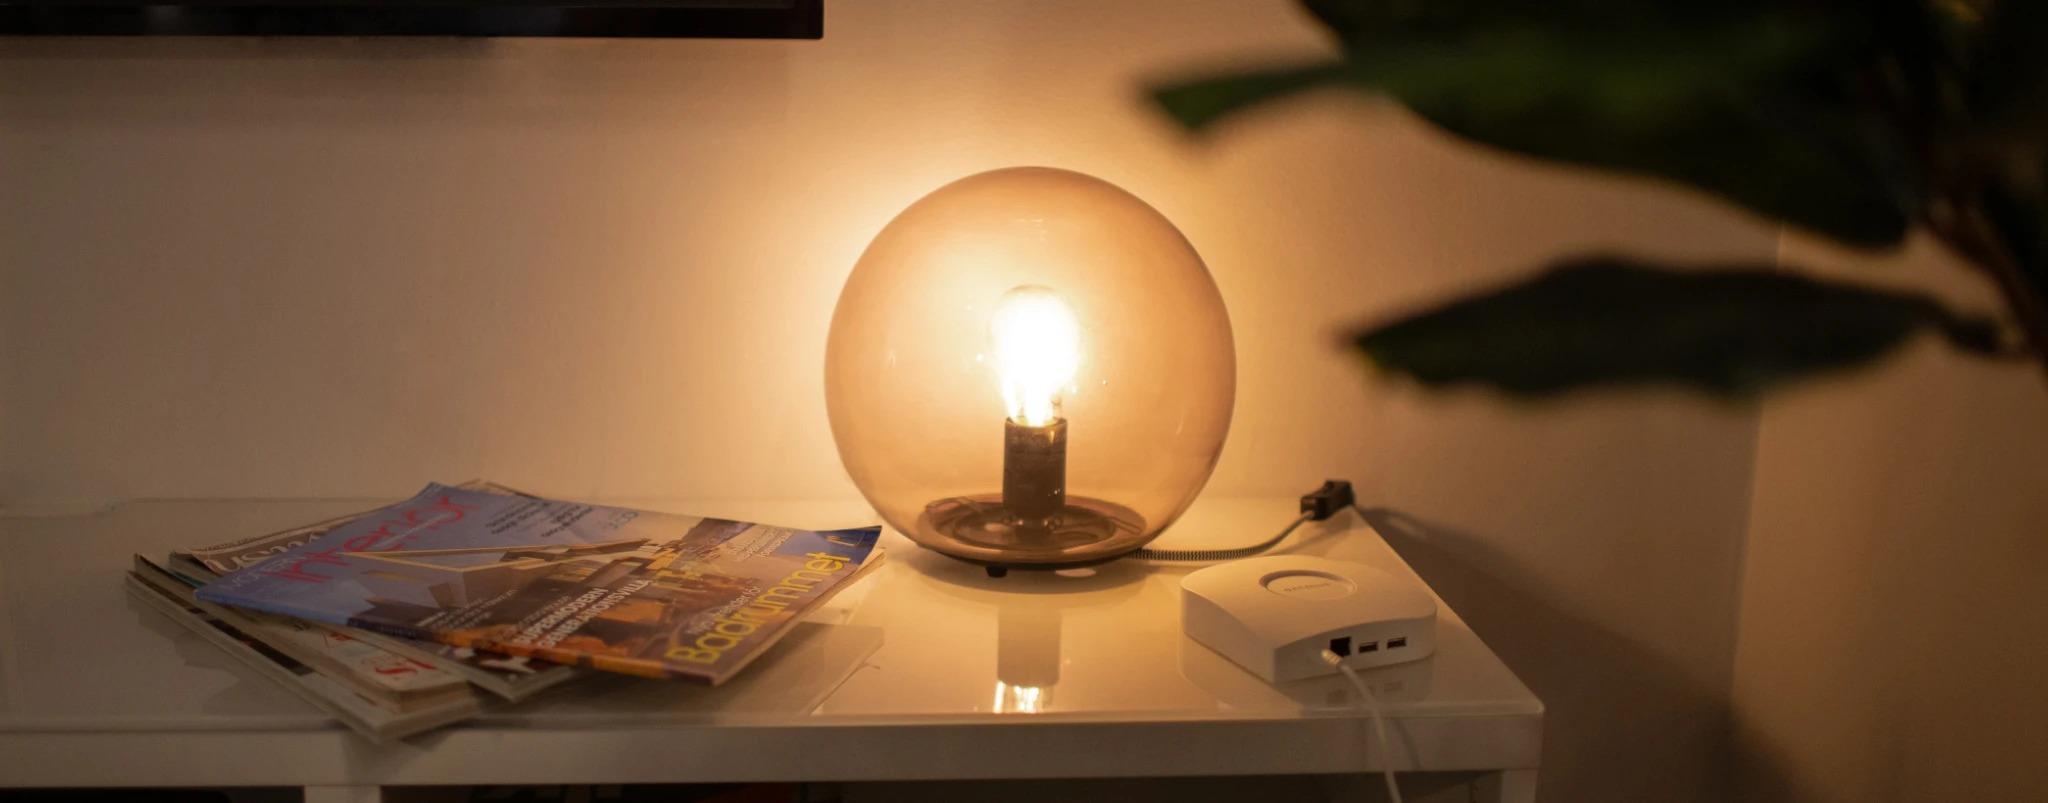 Animus-Heart-smart-home-gateway-video-image-2